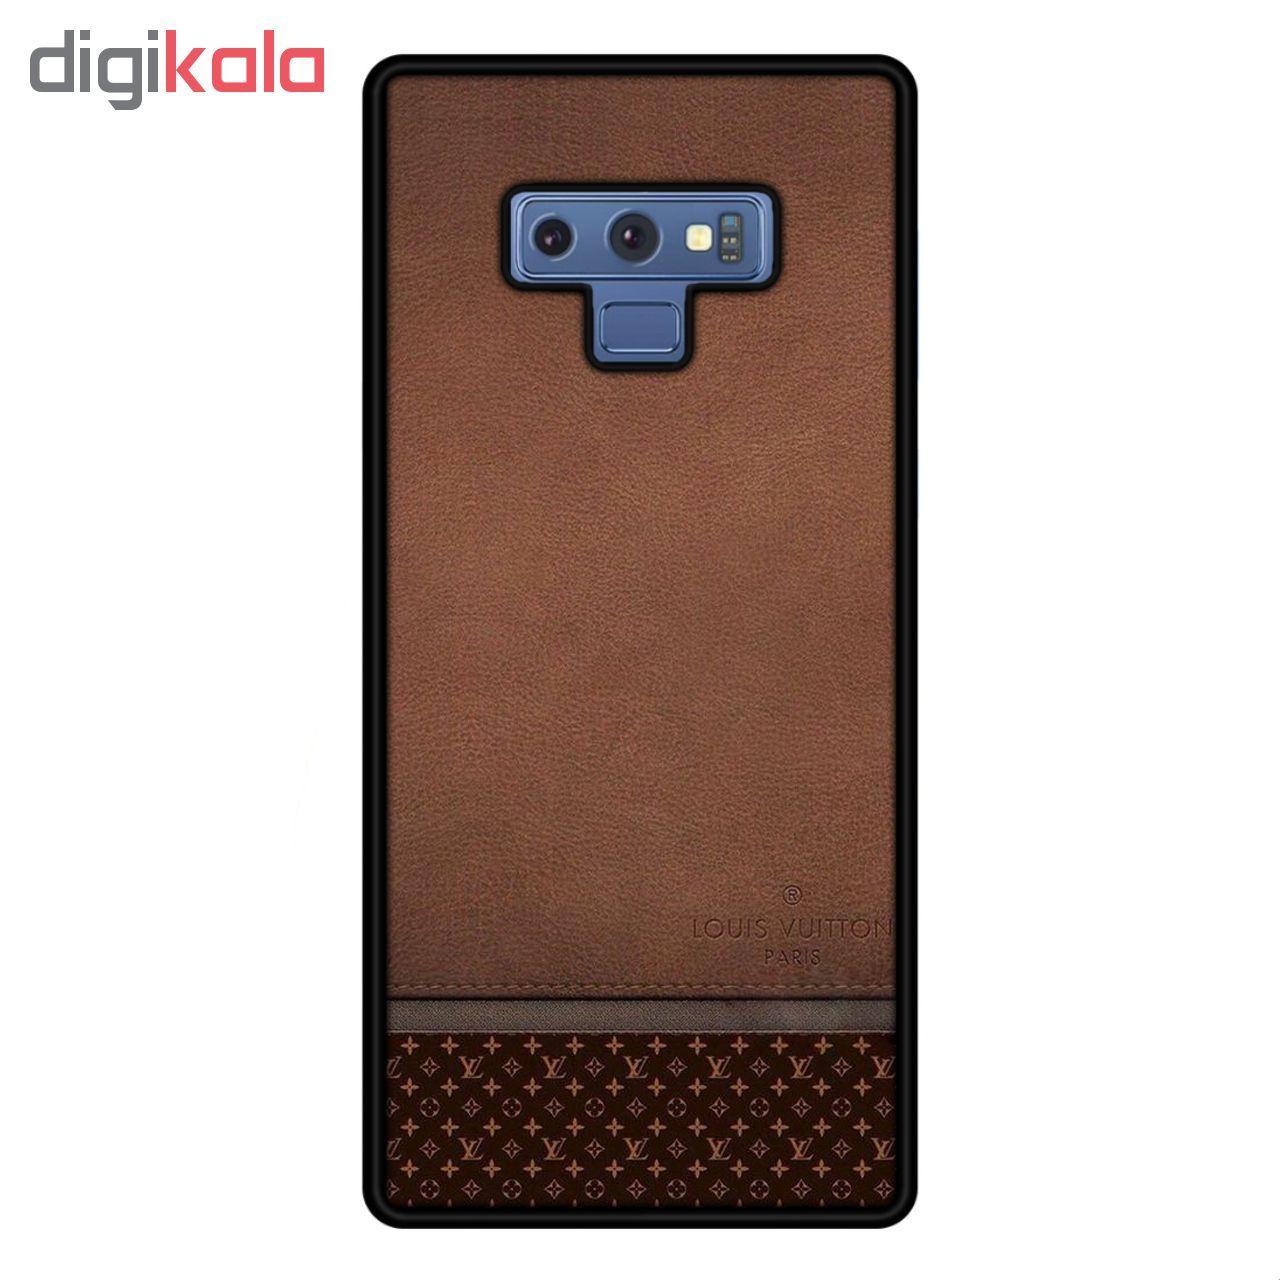 کاور آکام مدل AN91766 مناسب برای گوشی موبایل سامسونگ Galaxy Note 9 main 1 1